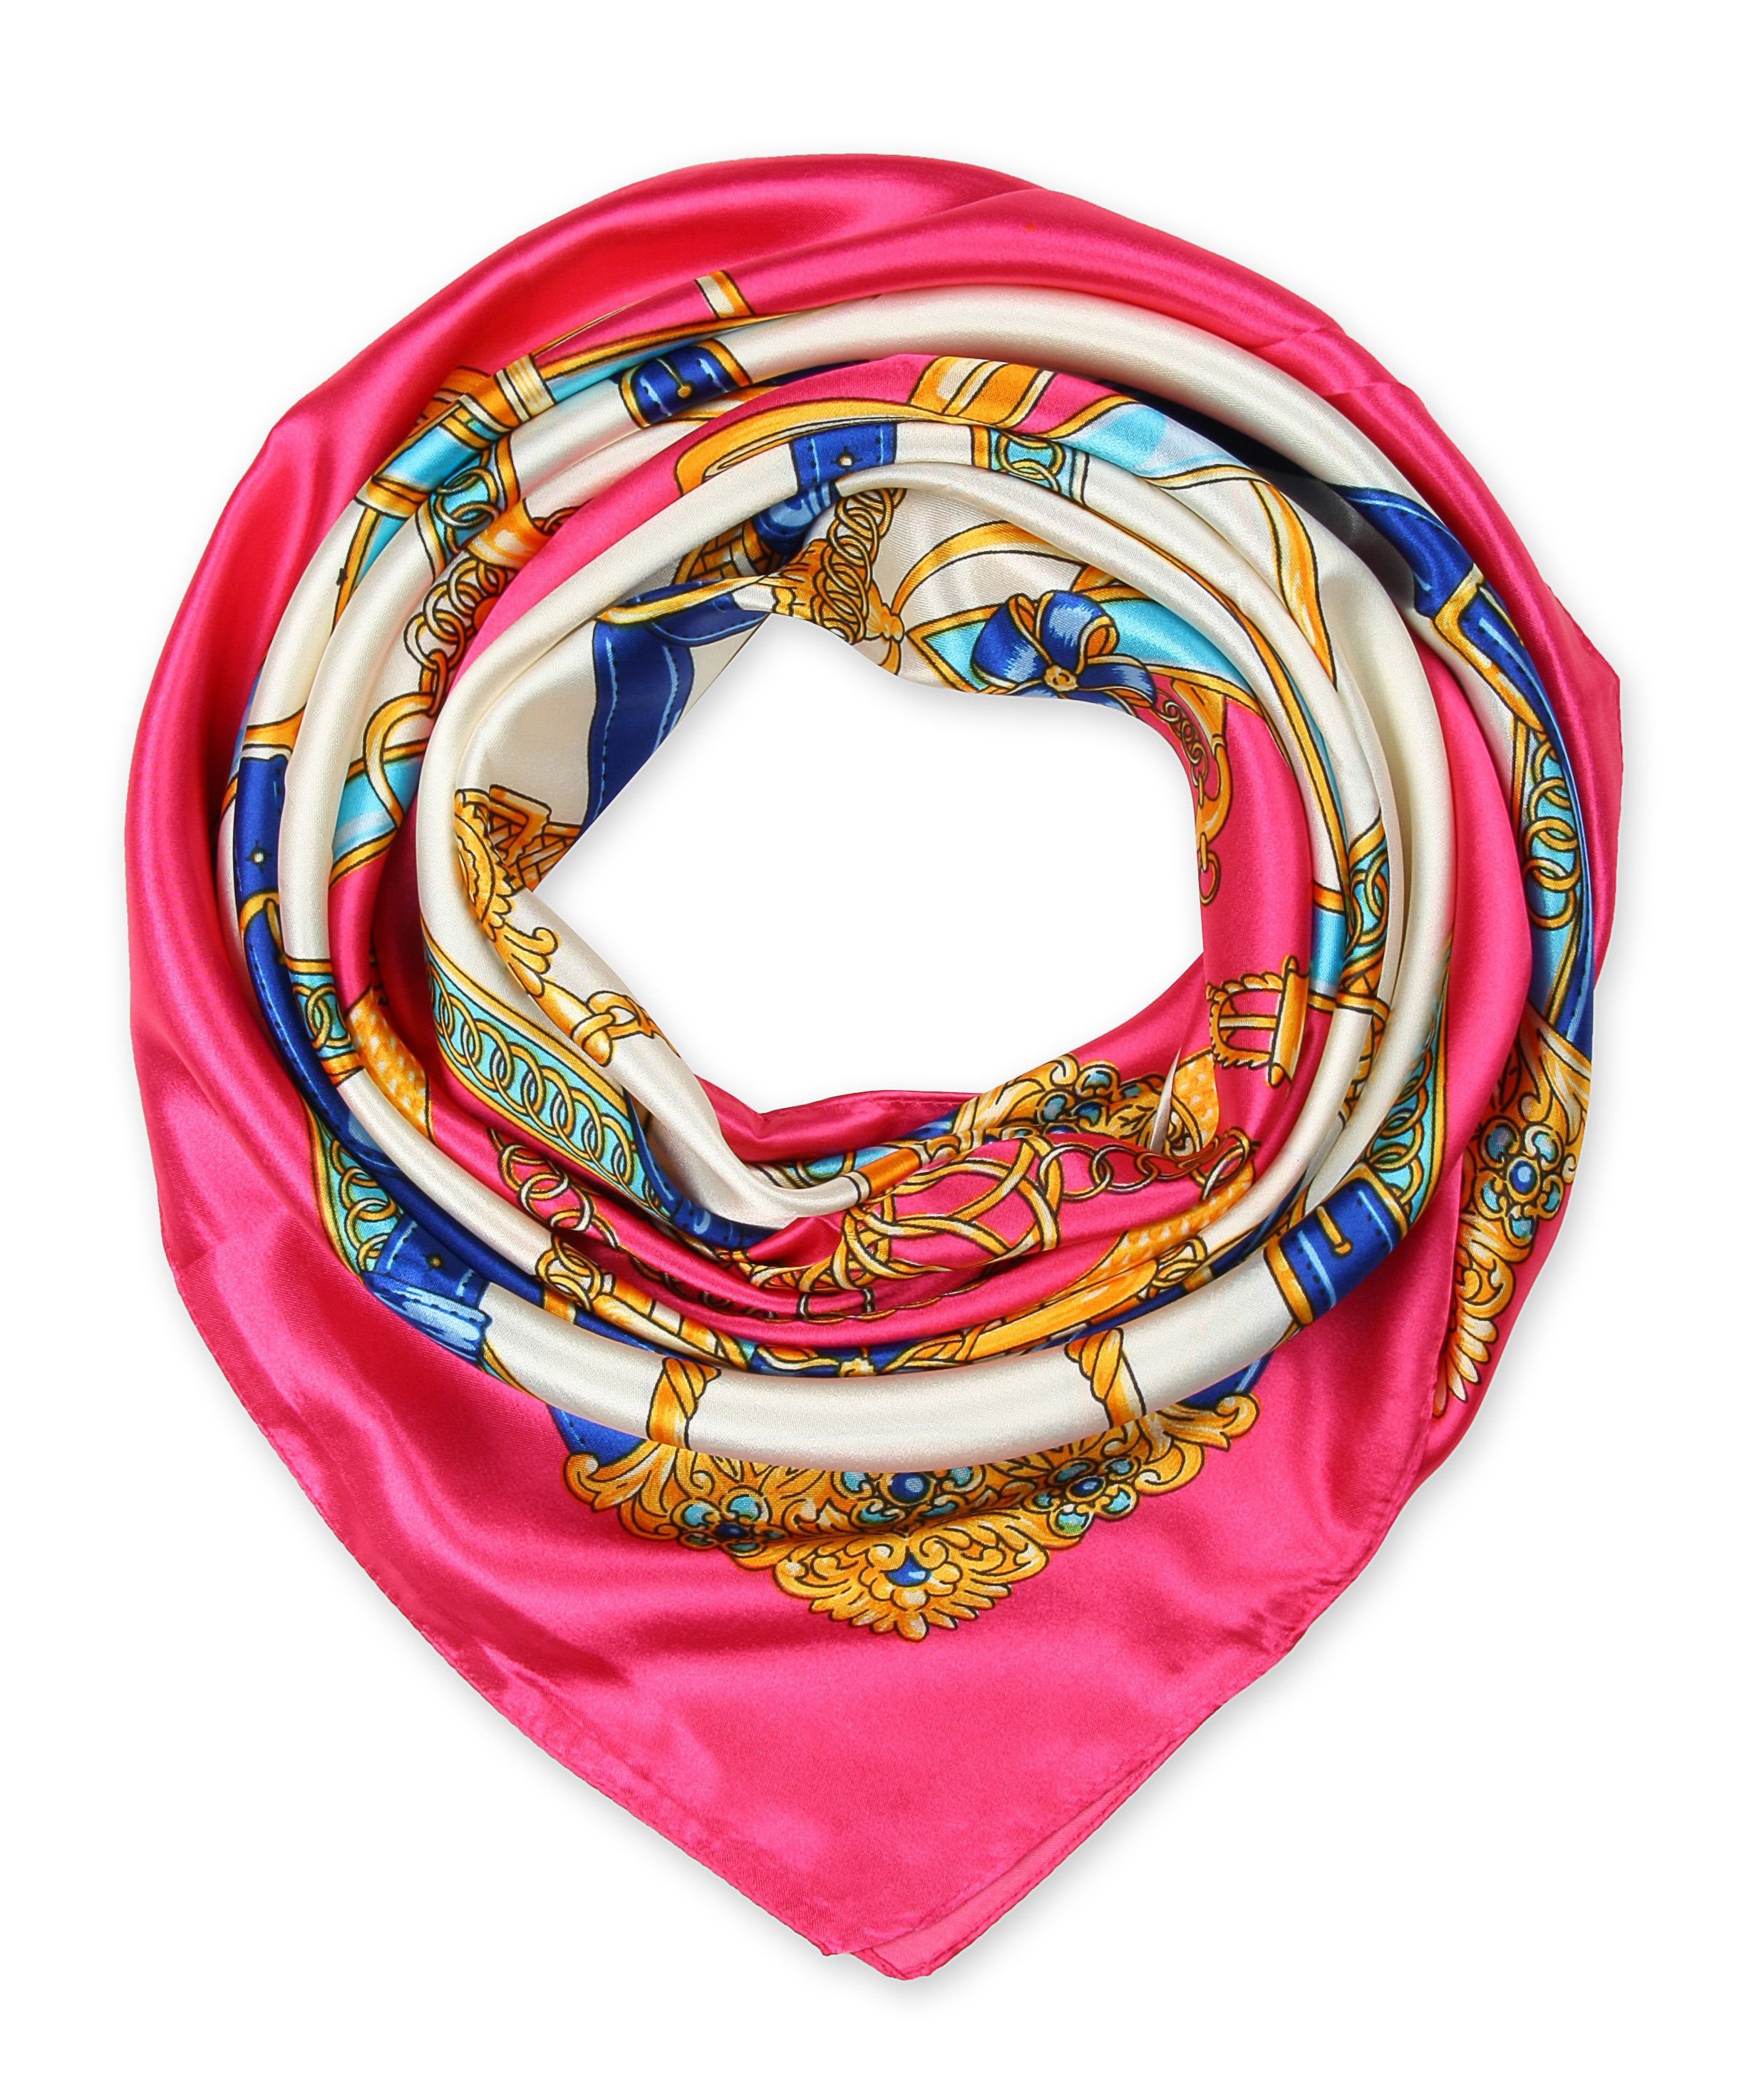 corciova Women's Graphic Print Silk Feeling Square Scarf Neckerchief 35x35 Inches Cerise Pink $9.99 Free Shipping